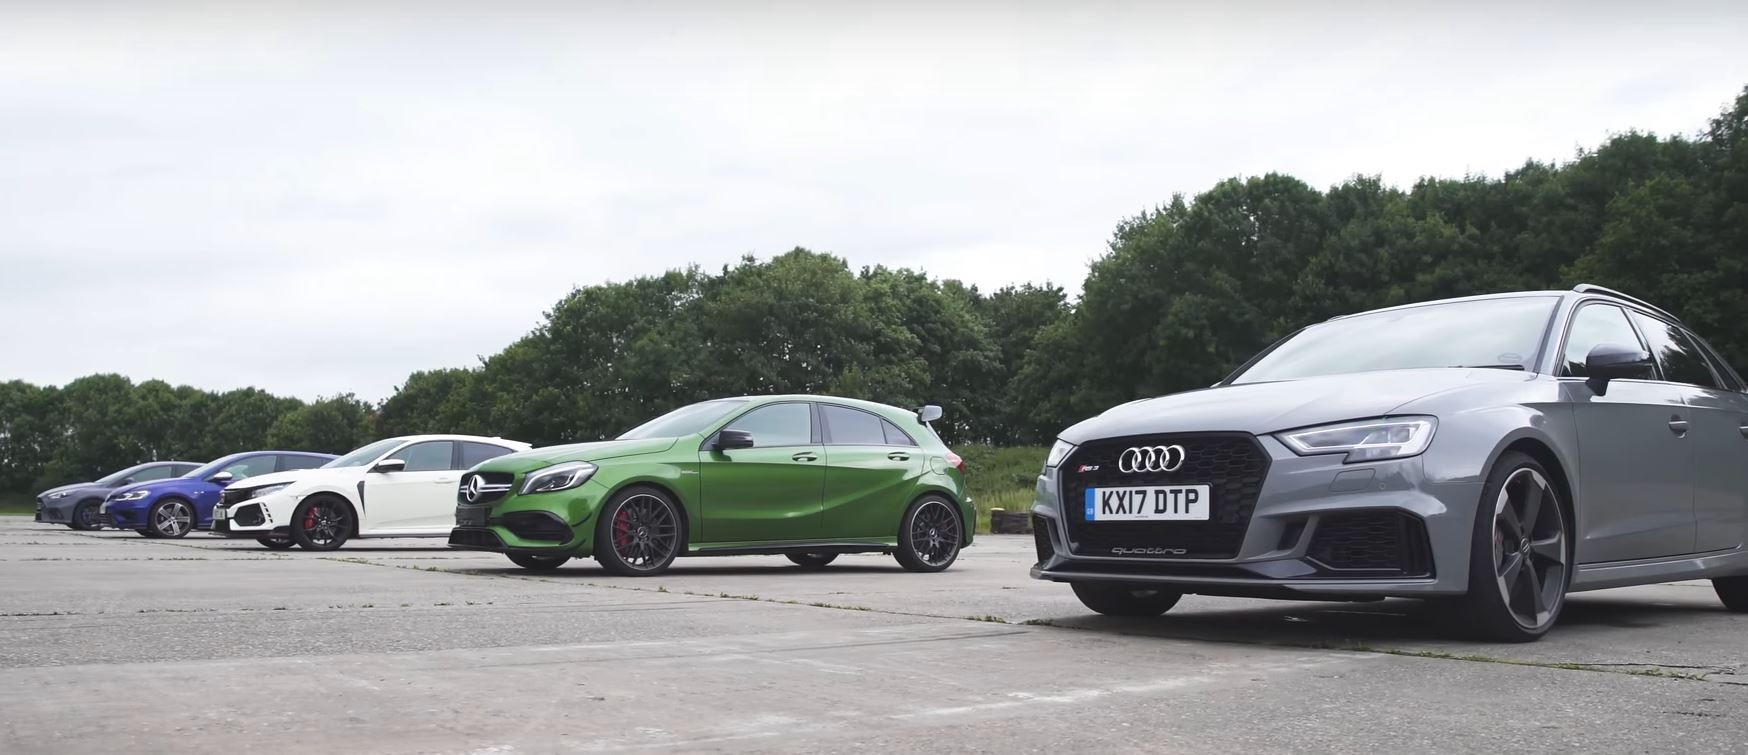 Kelebihan Audi A45 Murah Berkualitas